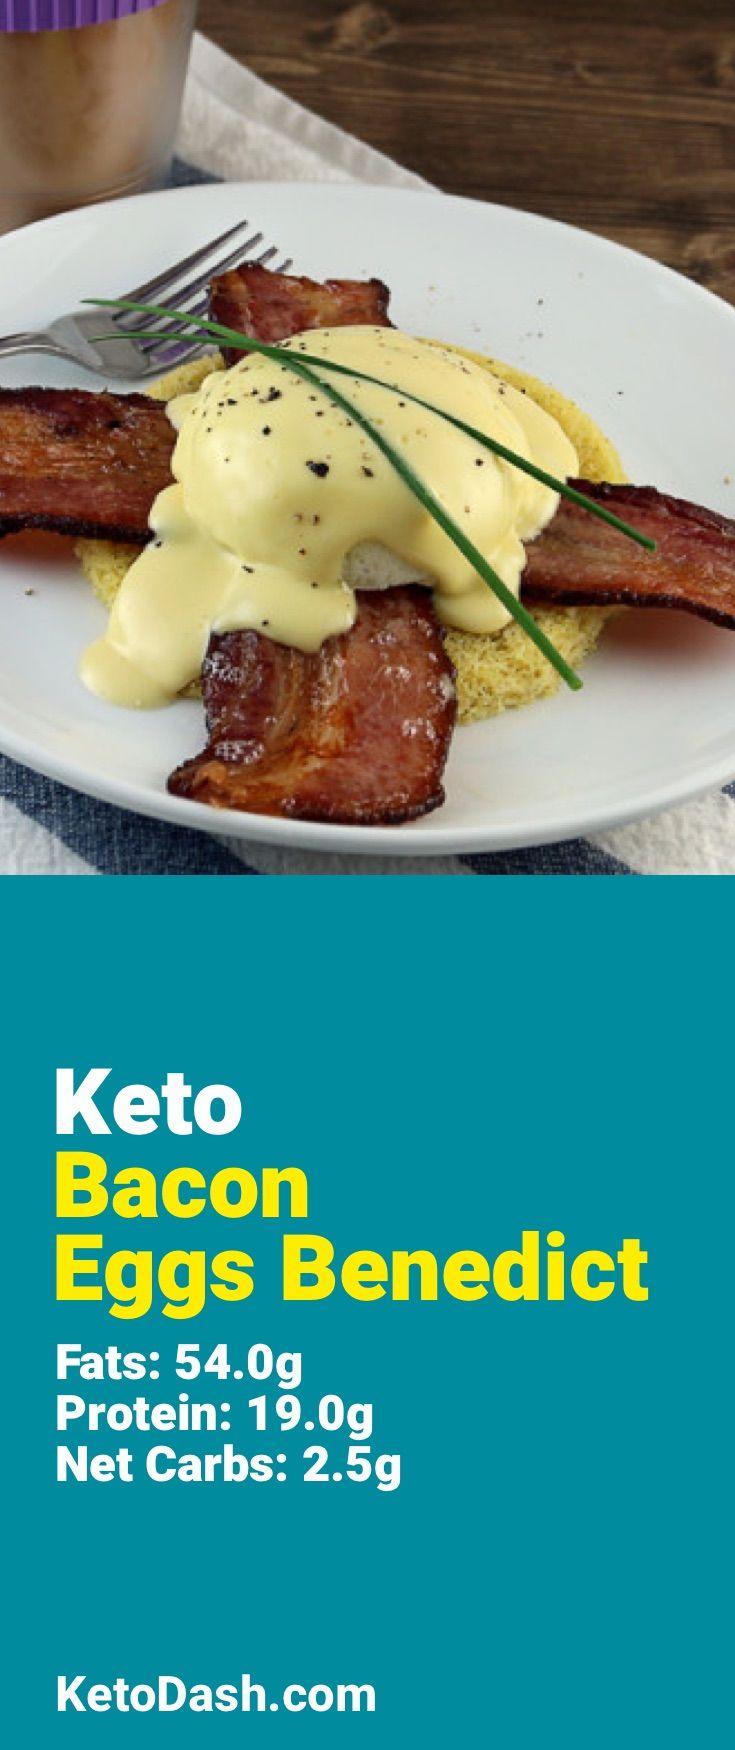 Keto bacon eggs Benedict